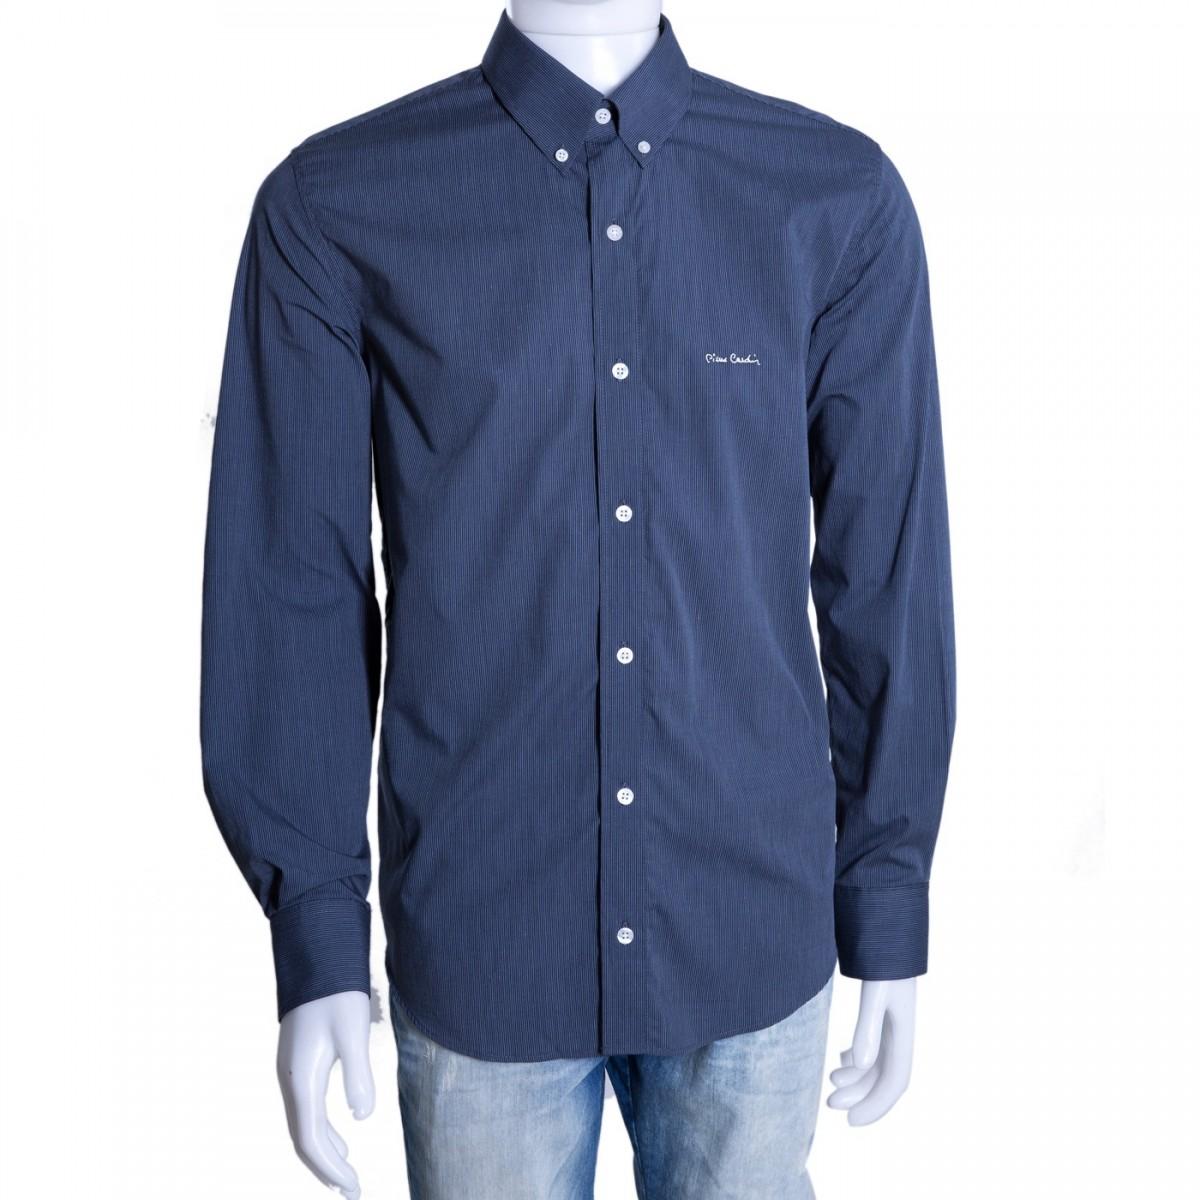 7f70ec118 Bizz Store - Camisa Social Masculina Pierre Cardin Manga Longa